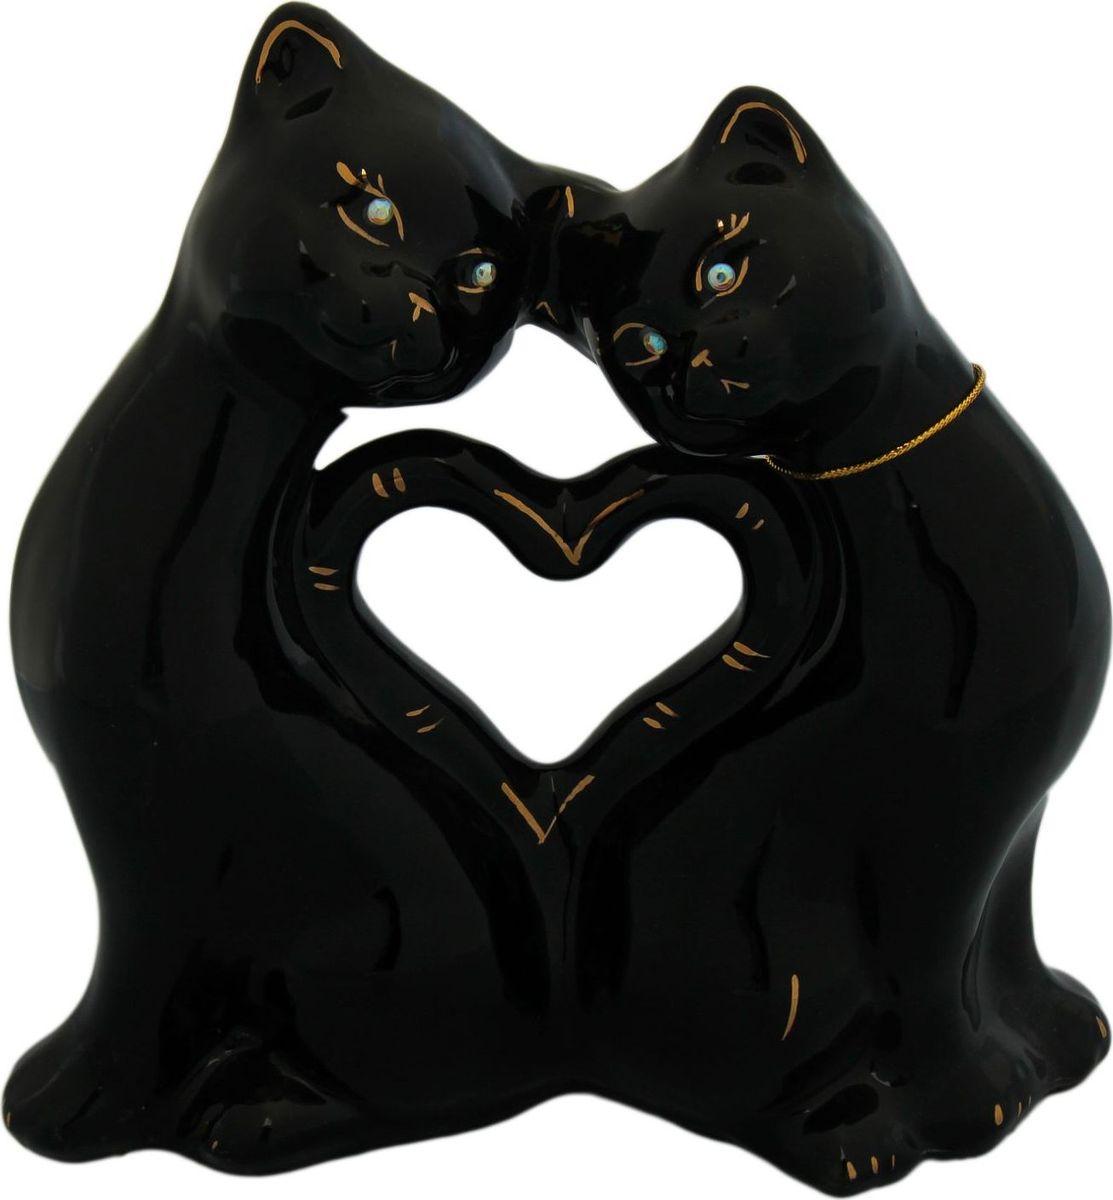 Копилка Керамика ручной работы Коты. Сердце, 9 х 25 х 26 см копилка керамика ручной работы барышня в шляпе 11 х 11 х 32 см